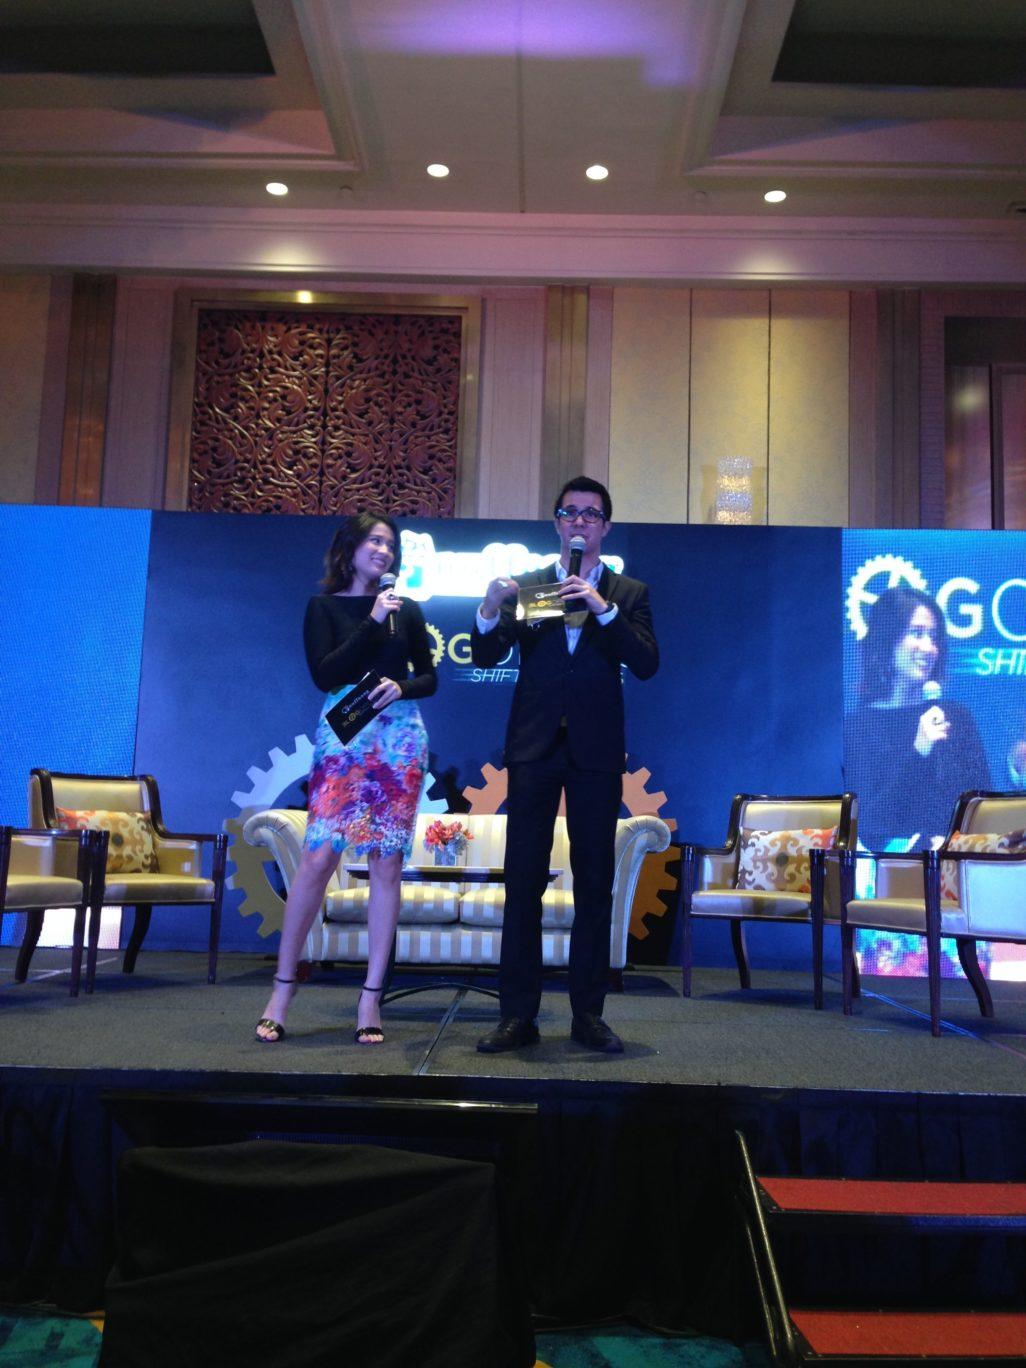 The articulate hosts were Karla Aguas and Justin Quirino.